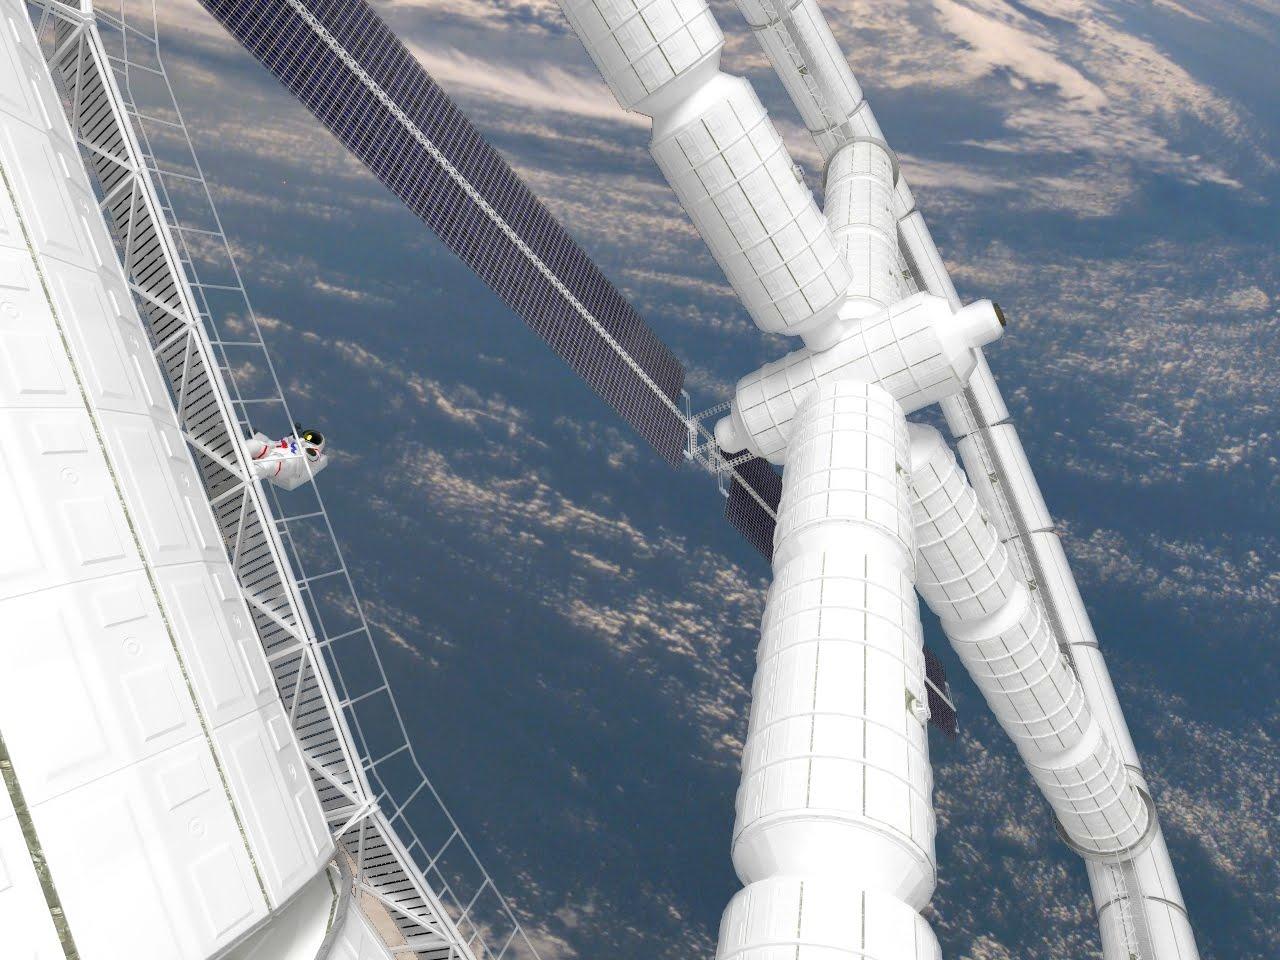 multiple torus space station - photo #5